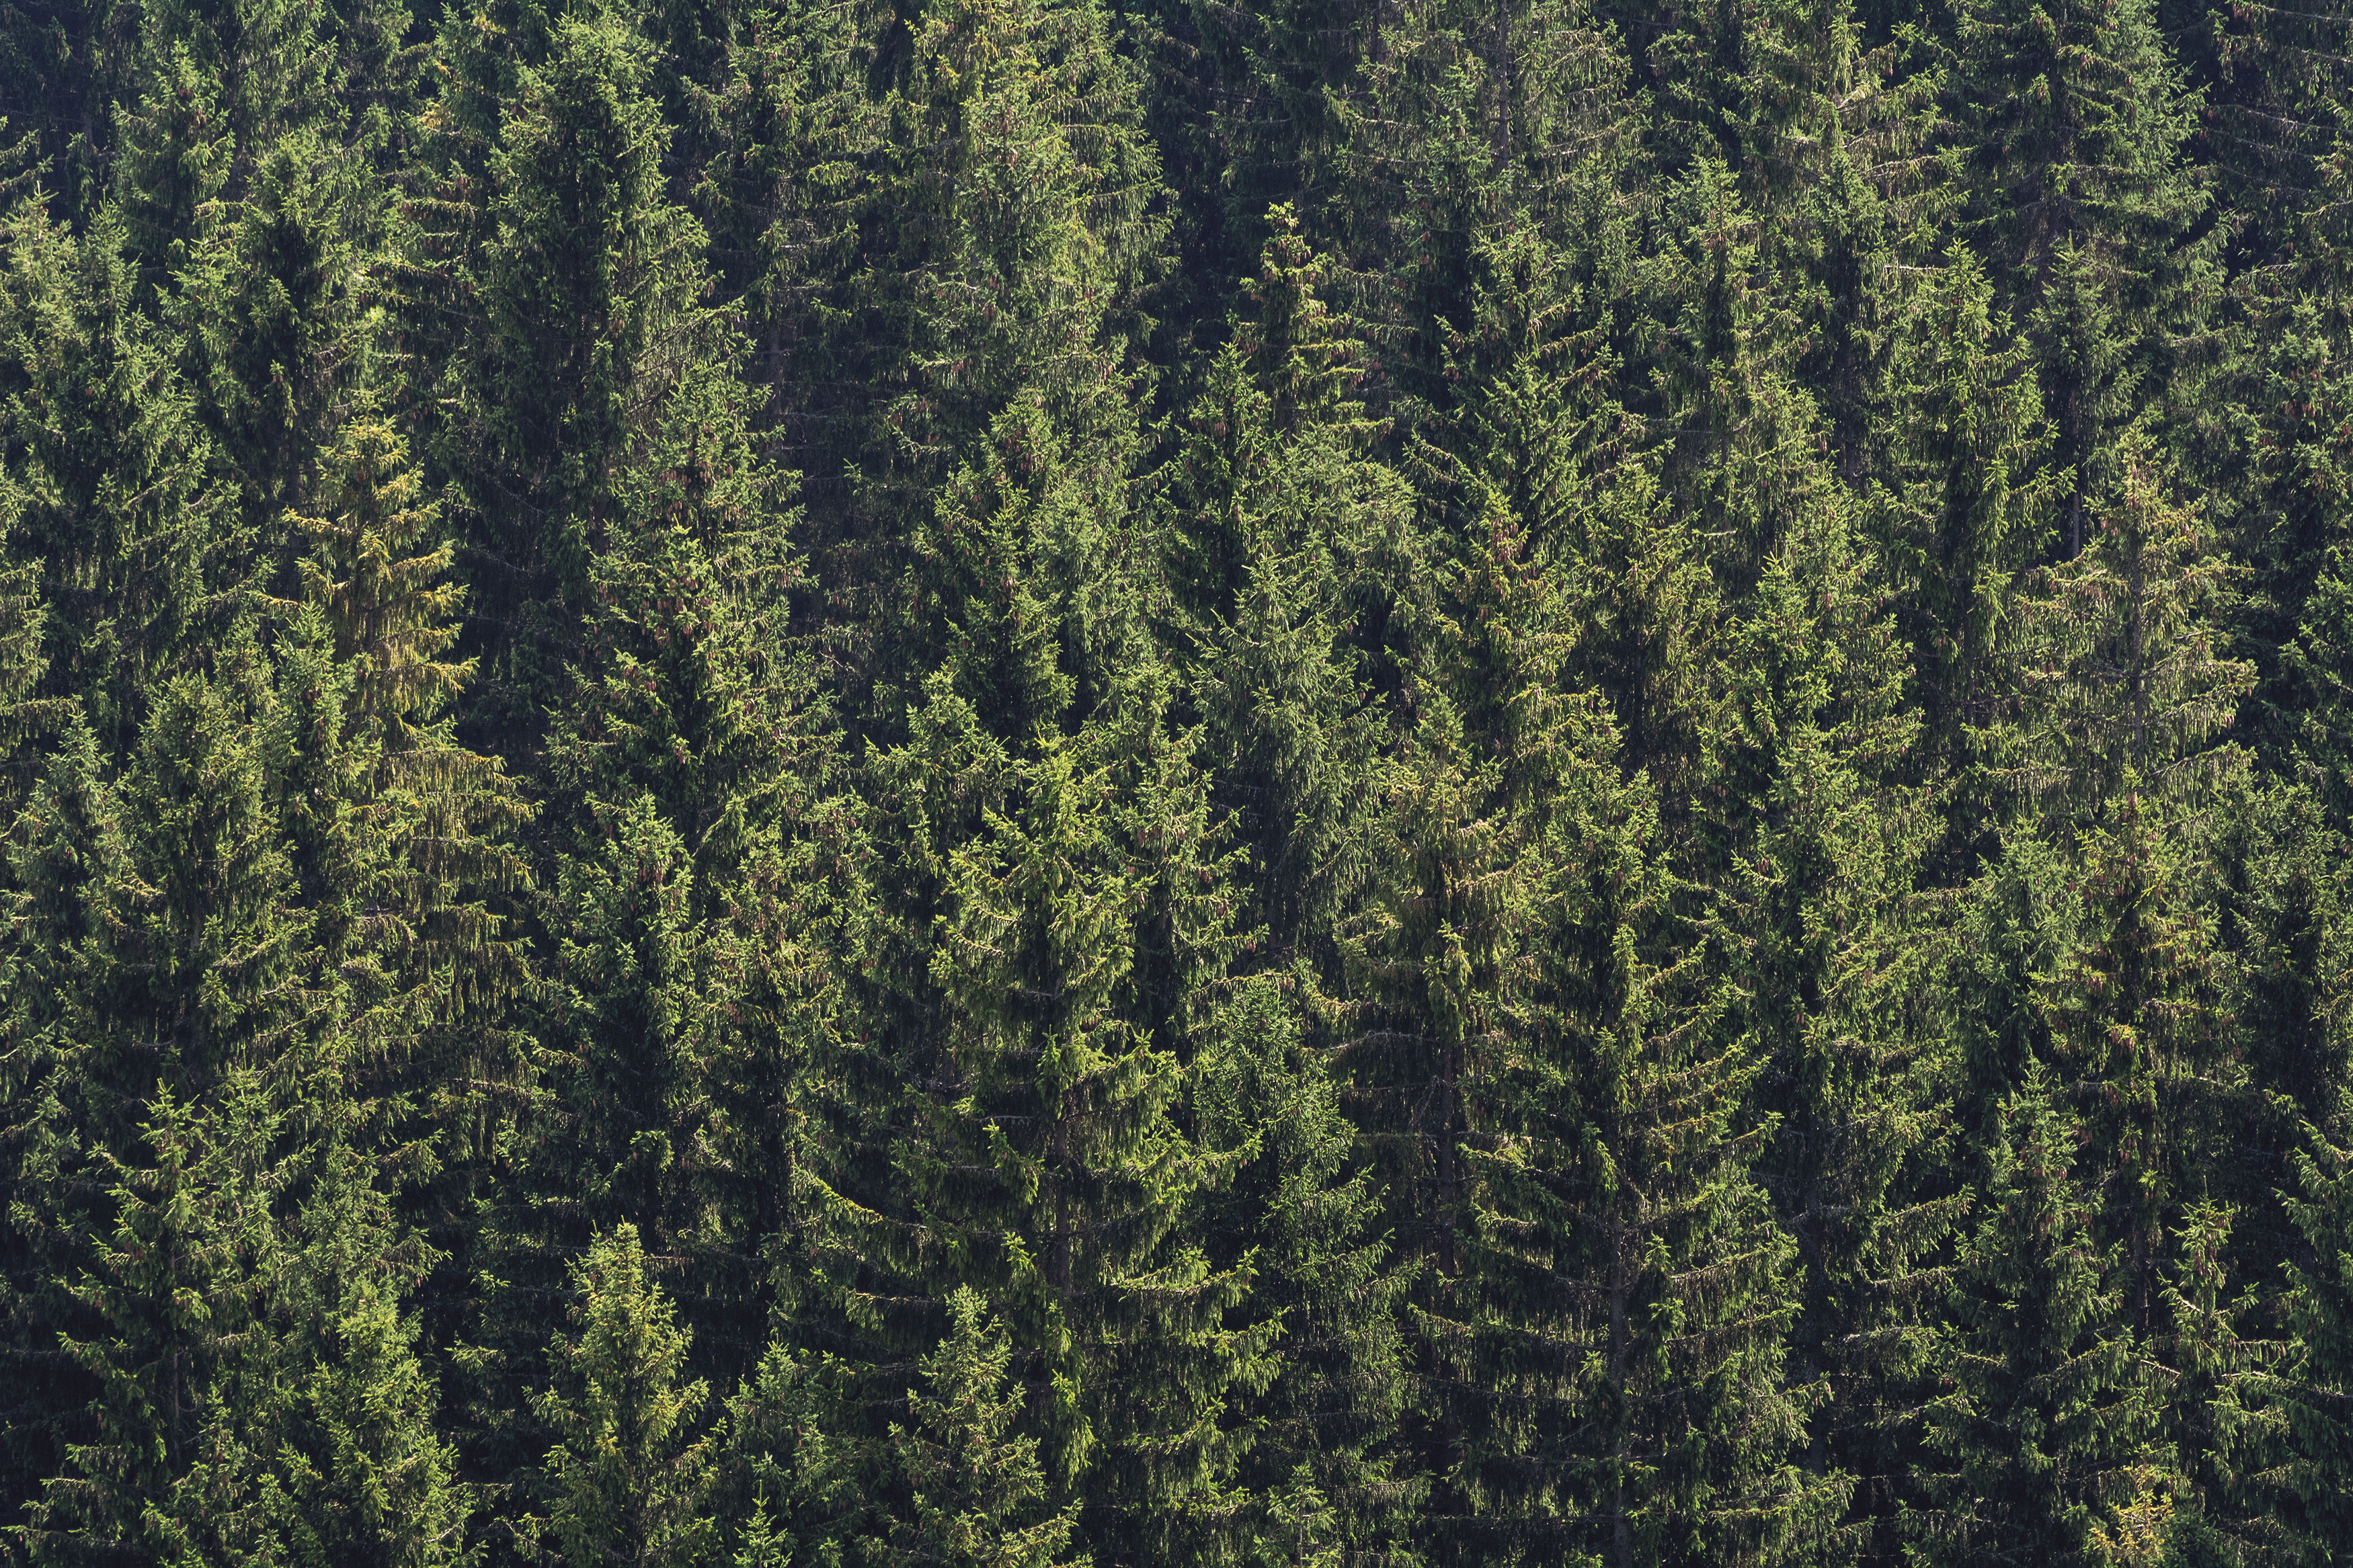 Forest Background Free Stock Photo Libreshot